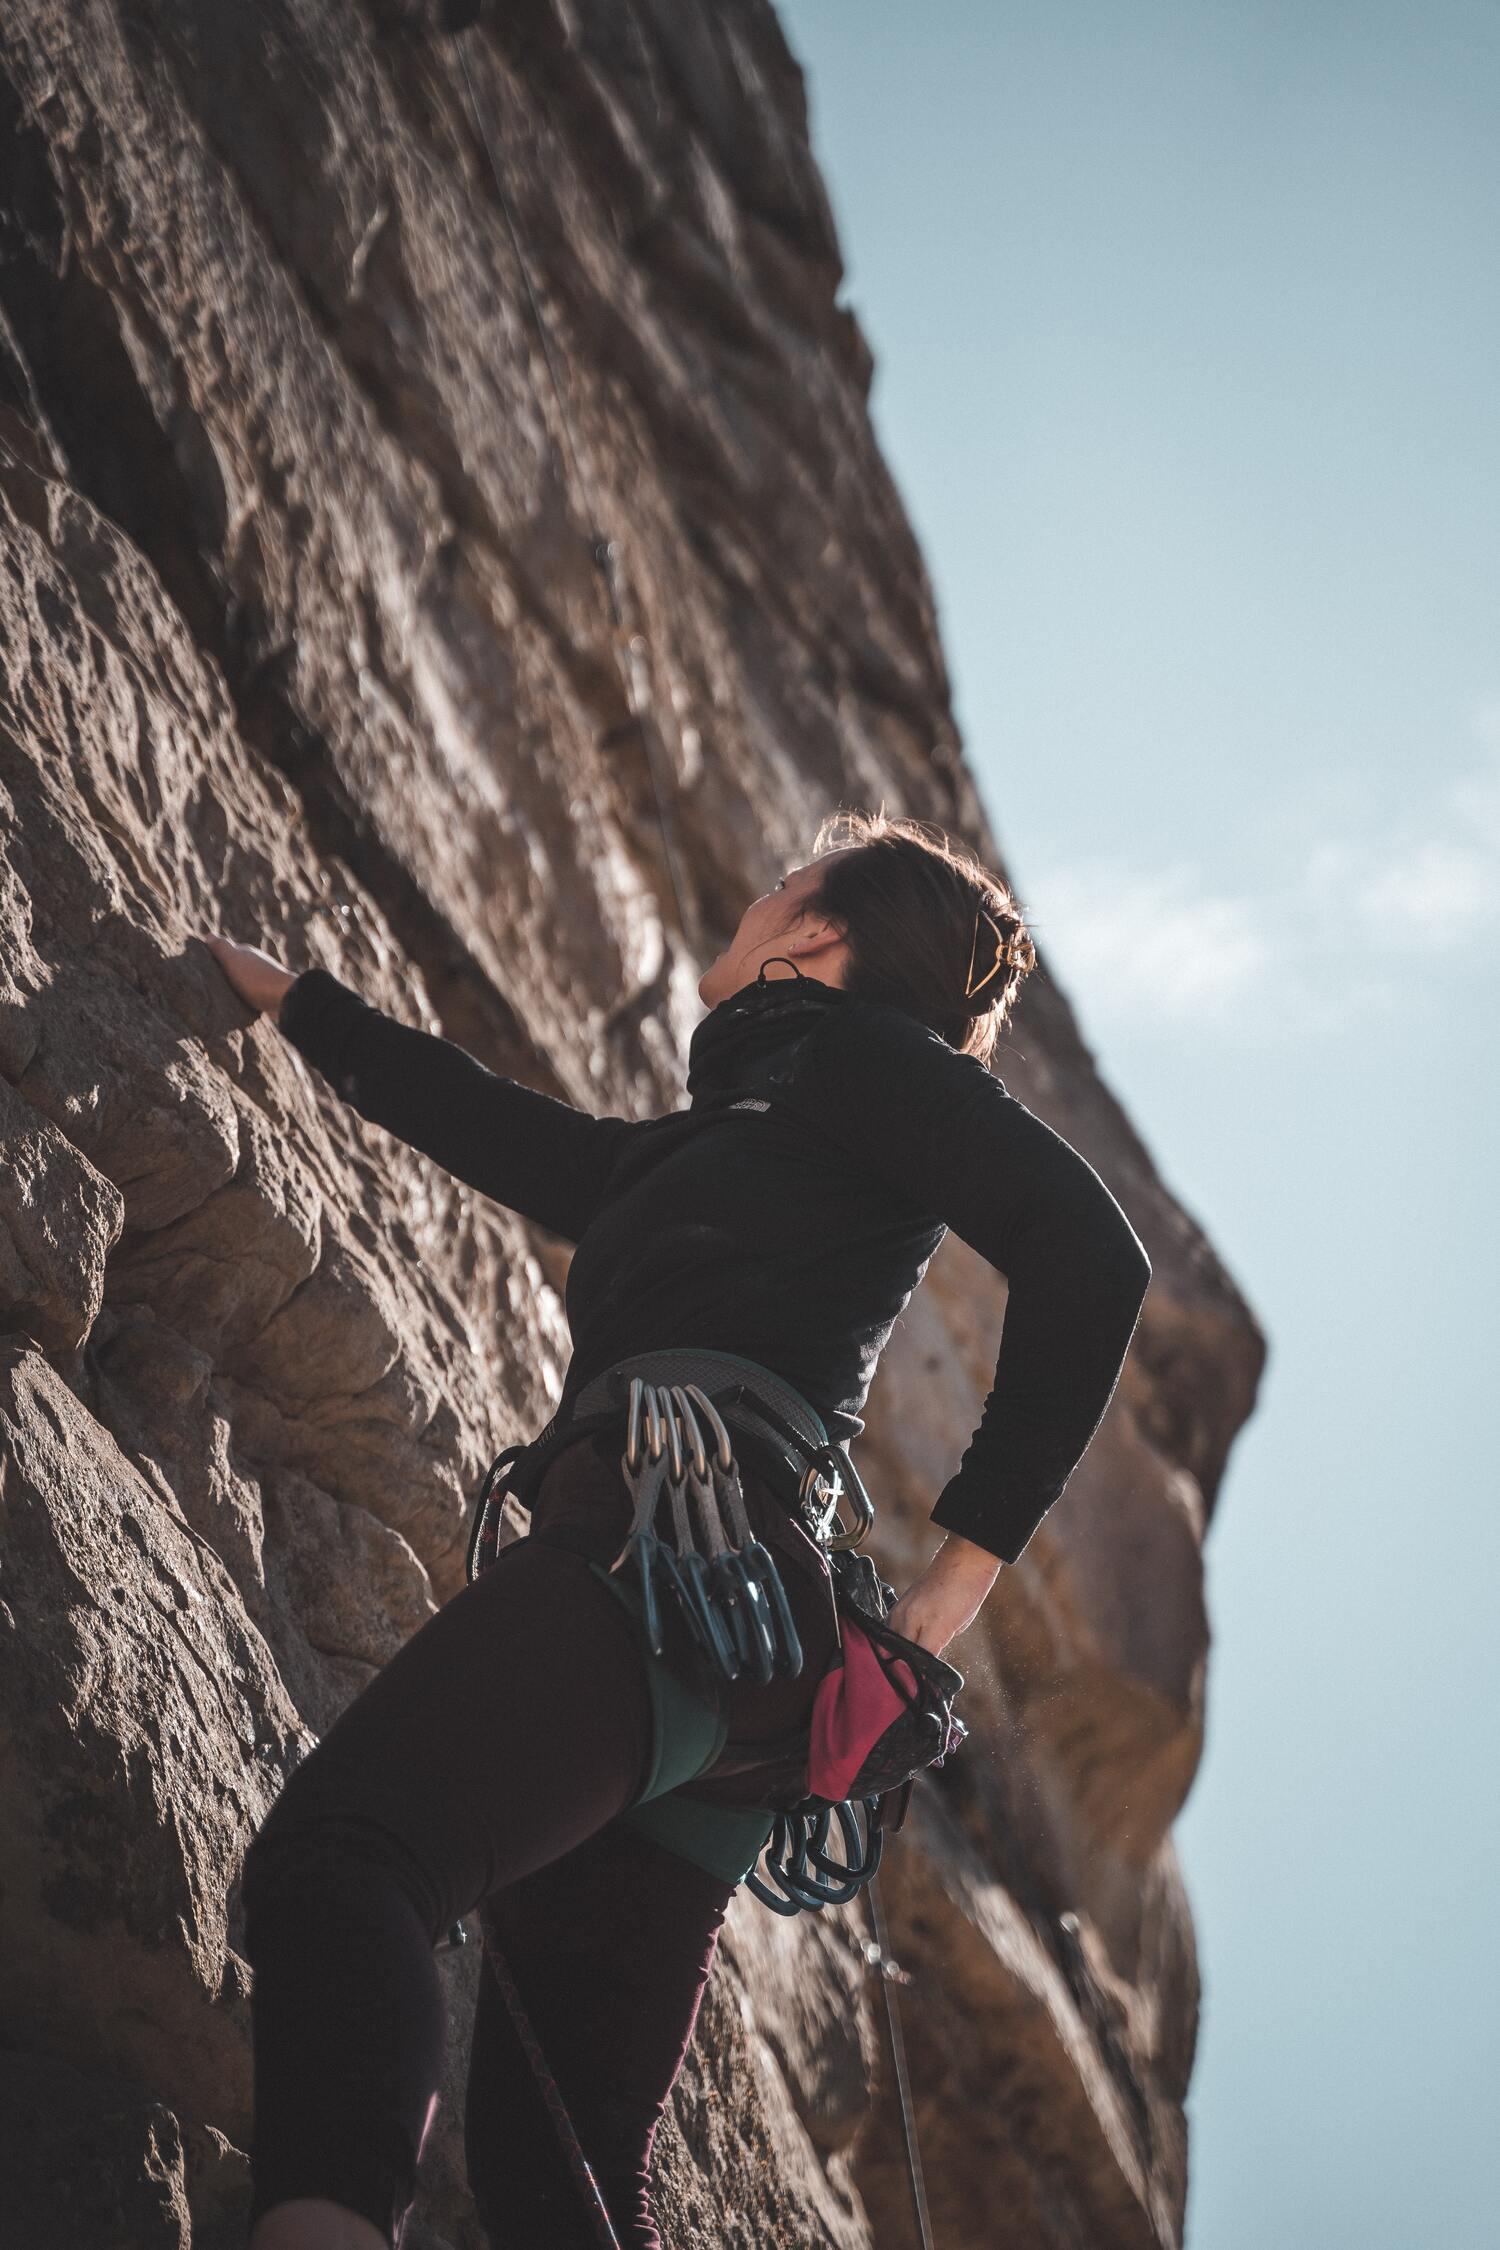 ejercicios para liberar adrenalina